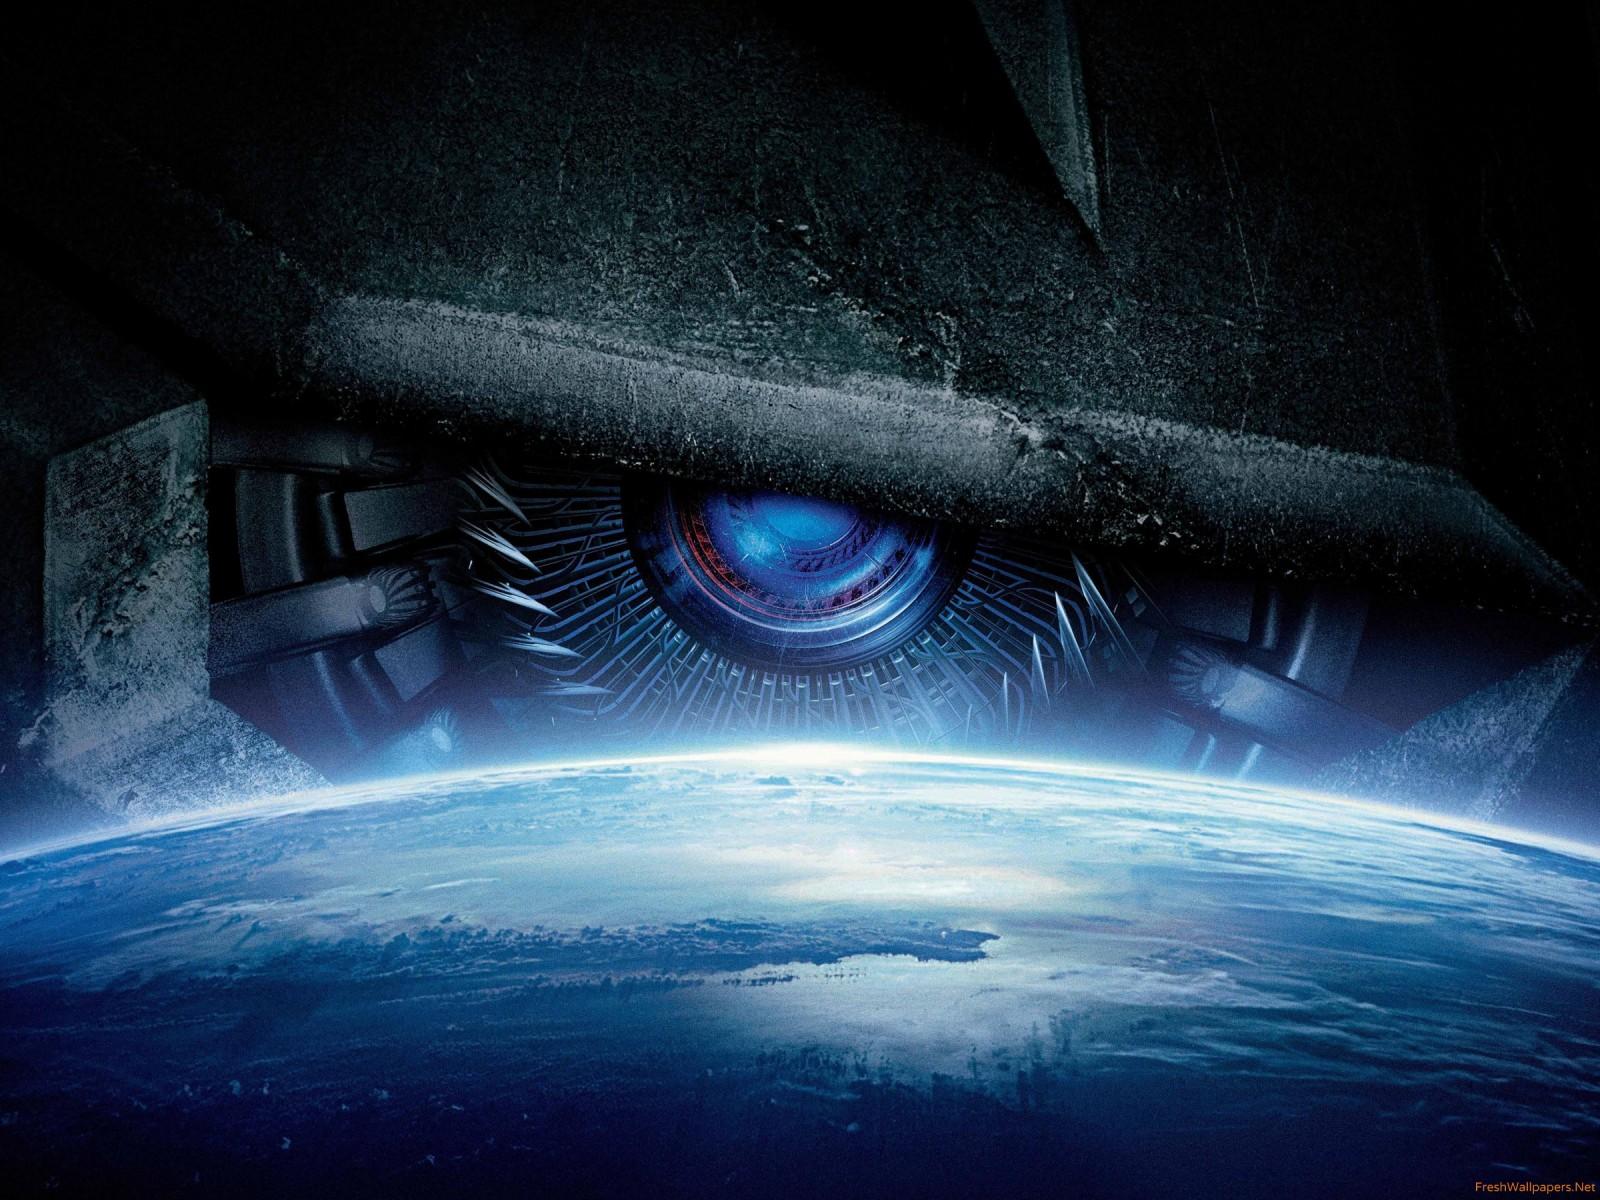 Transformers Earth Background   1600x1200 Wallpaper   teahubio 1600x1200